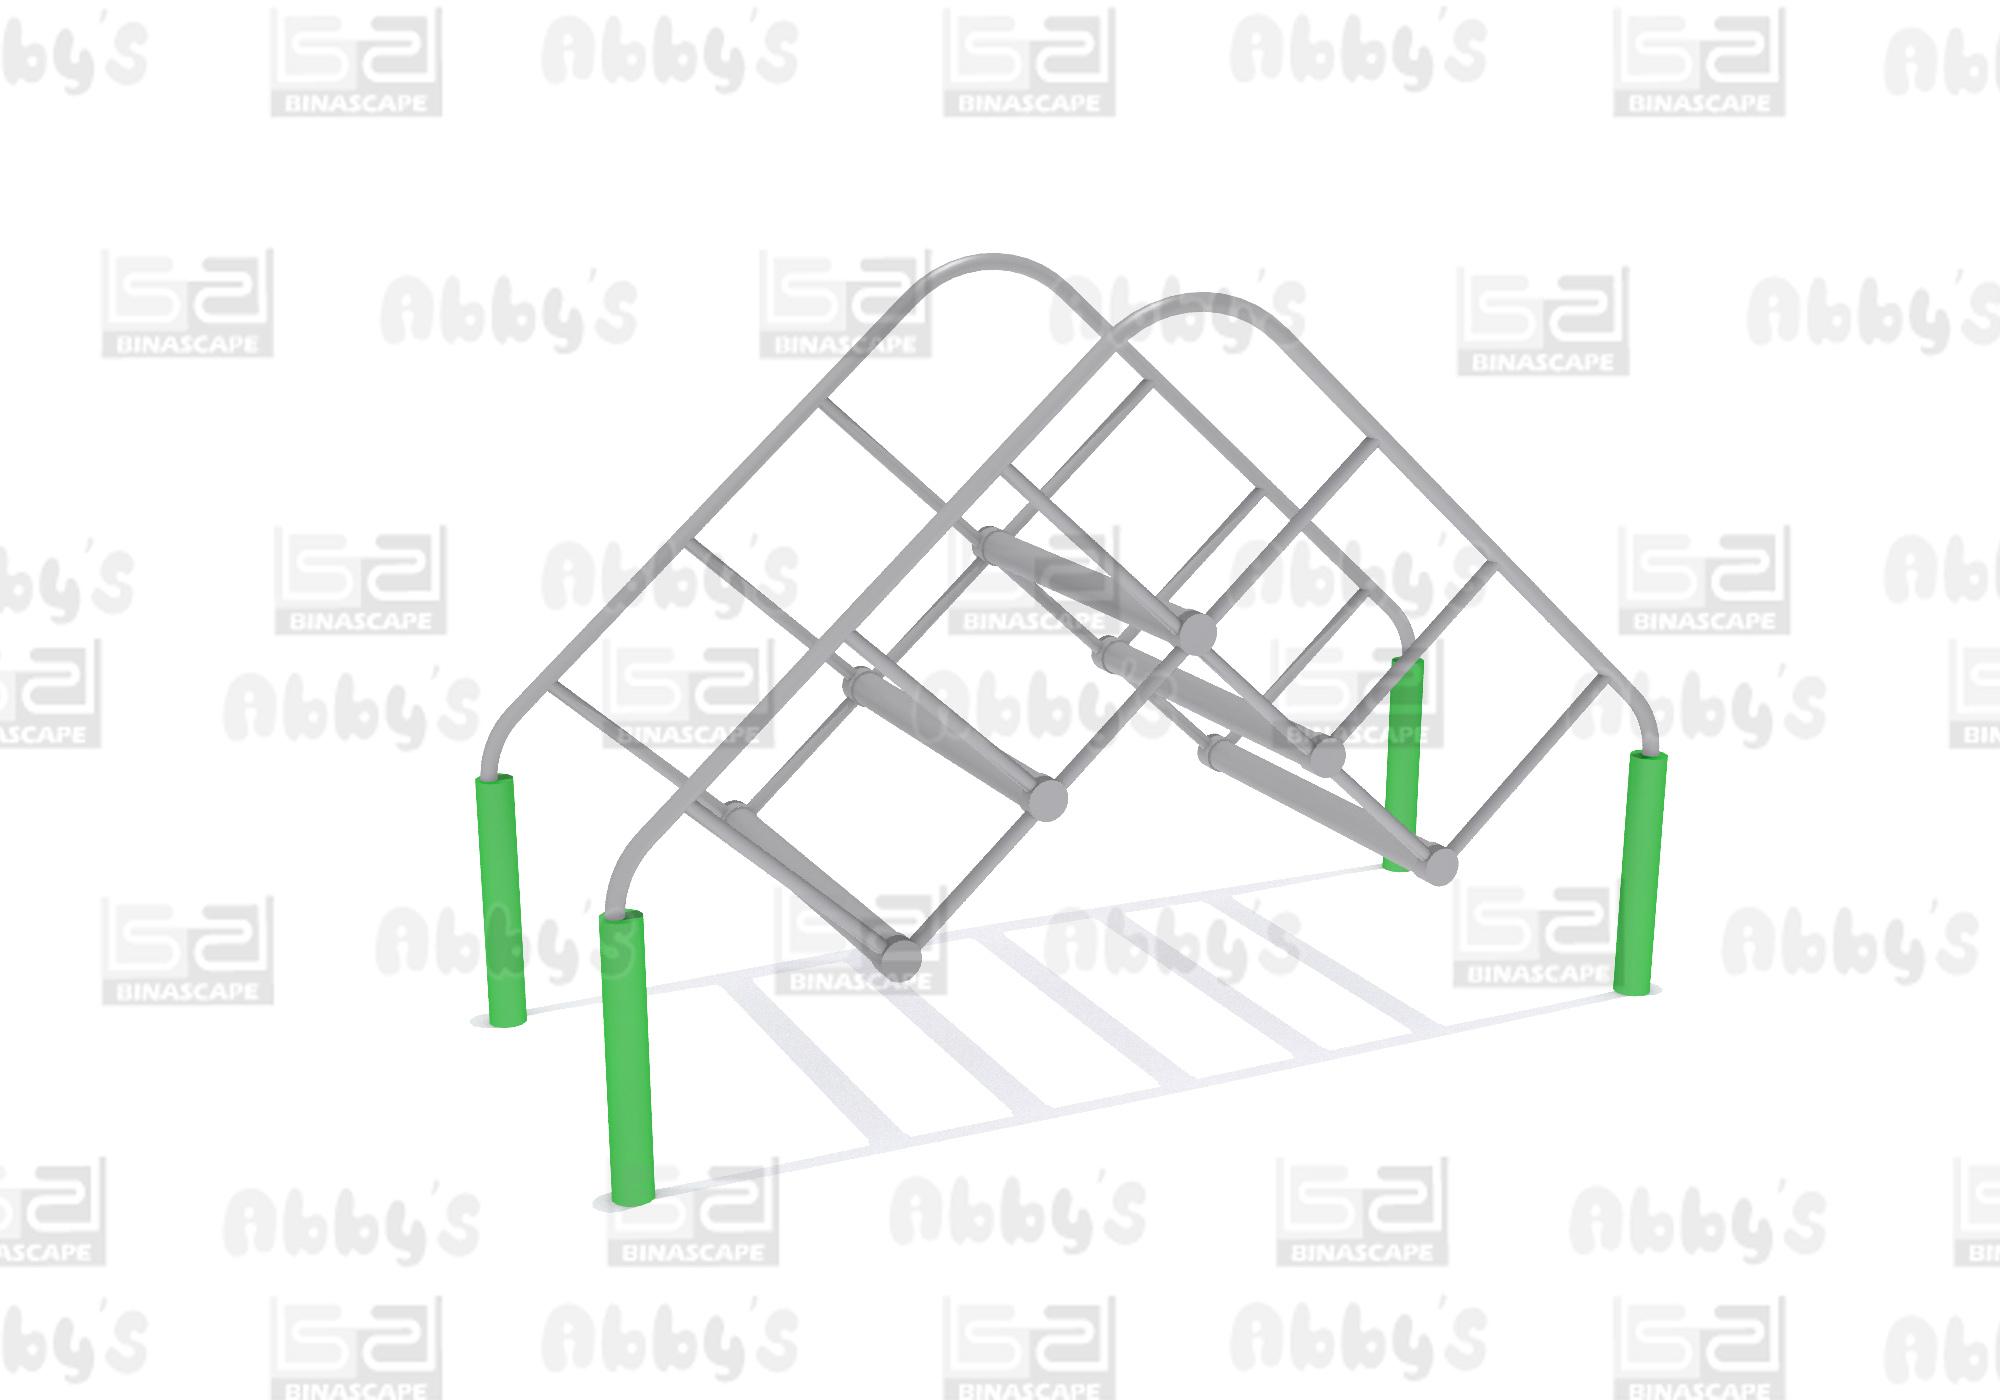 bS 014FC - BRIDGE LOG TRAINER